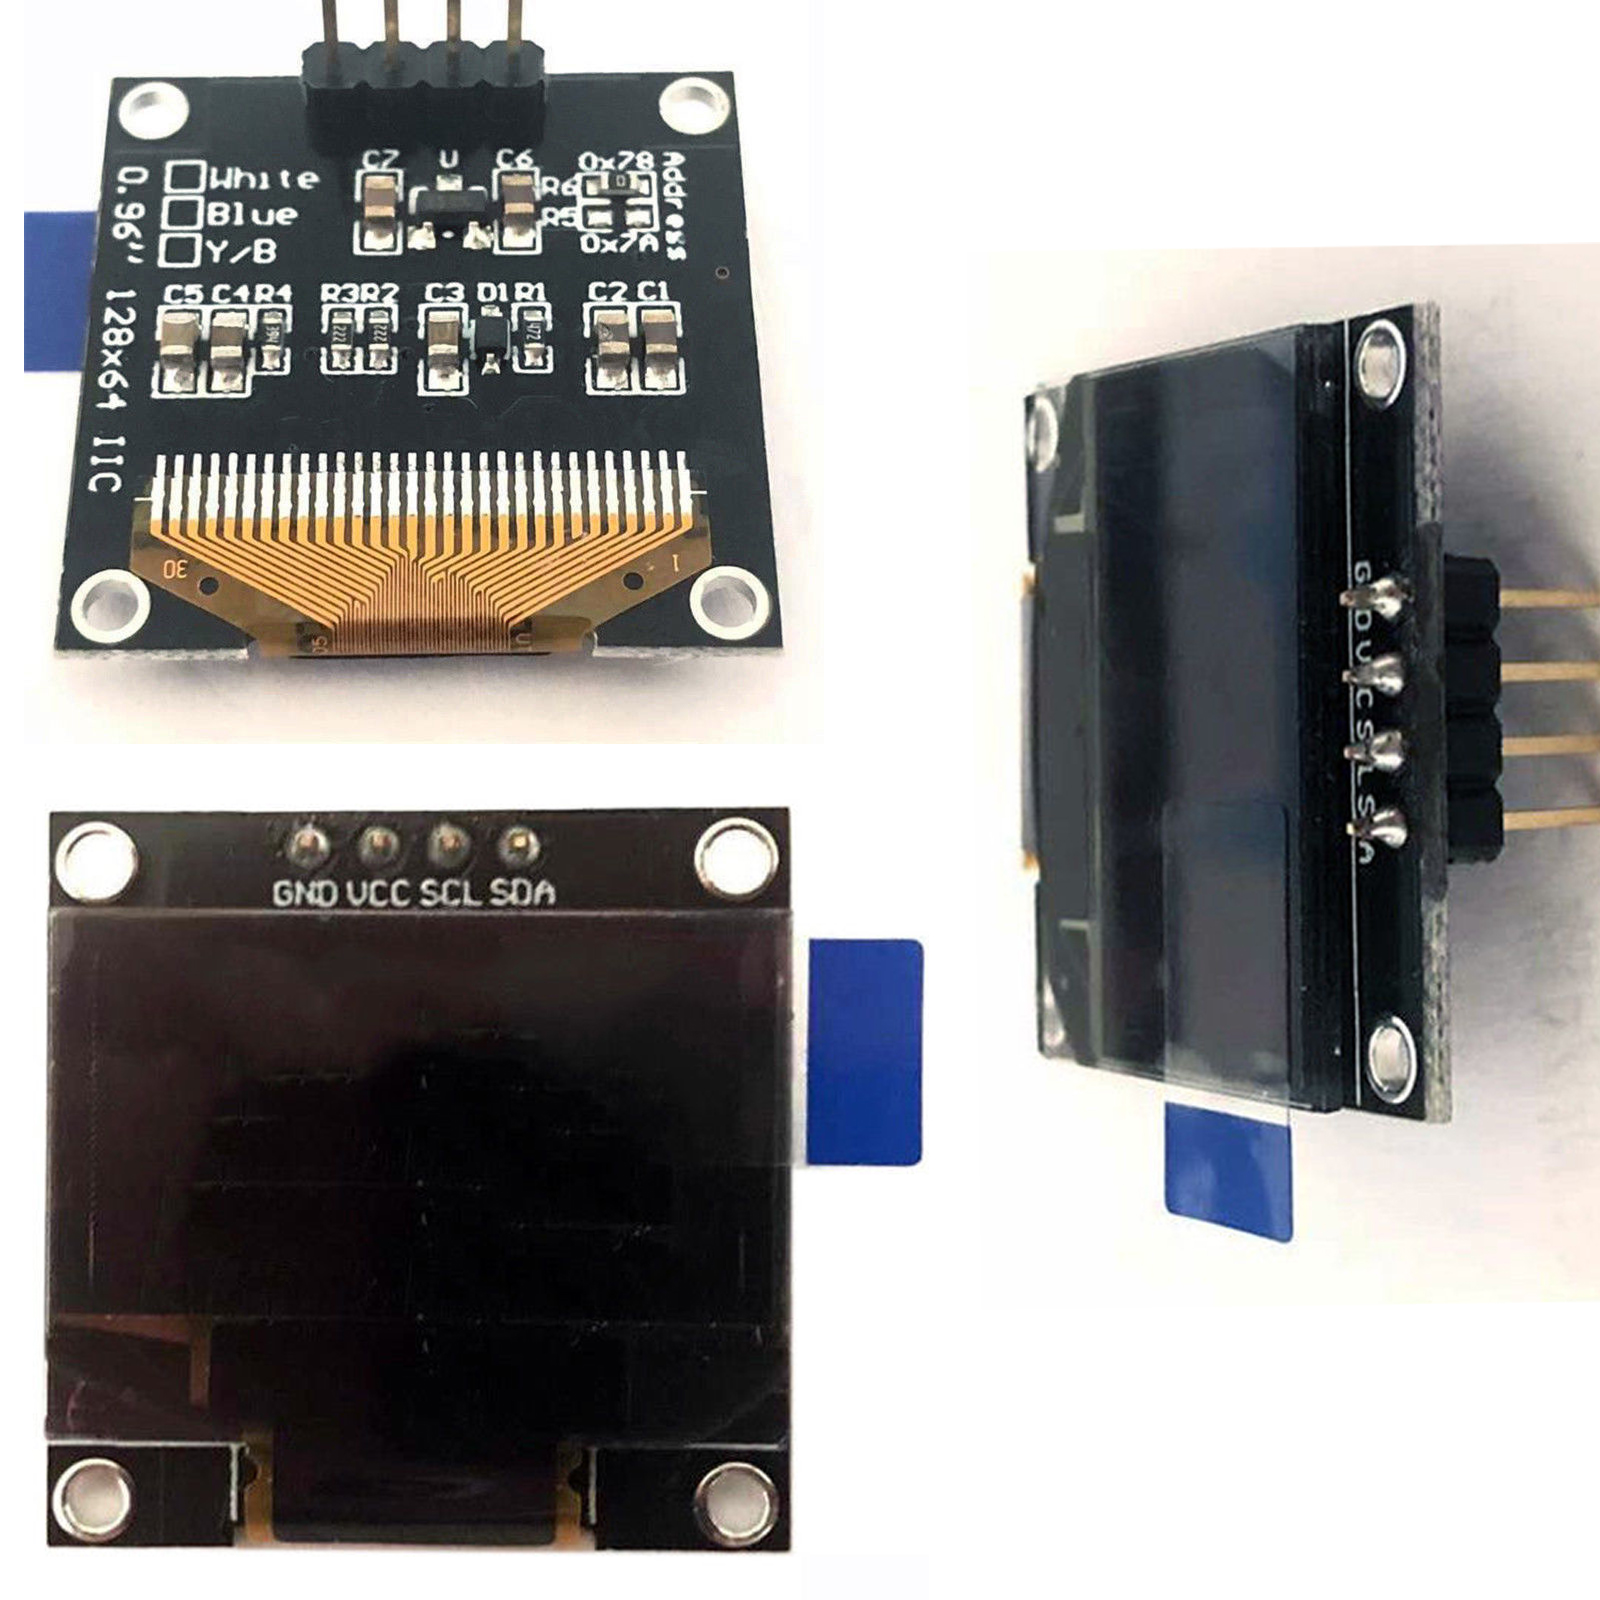 Pi 0,96 Zoll OLED Display I2C SDD1306 128x64 Modul in weiss für Arduino